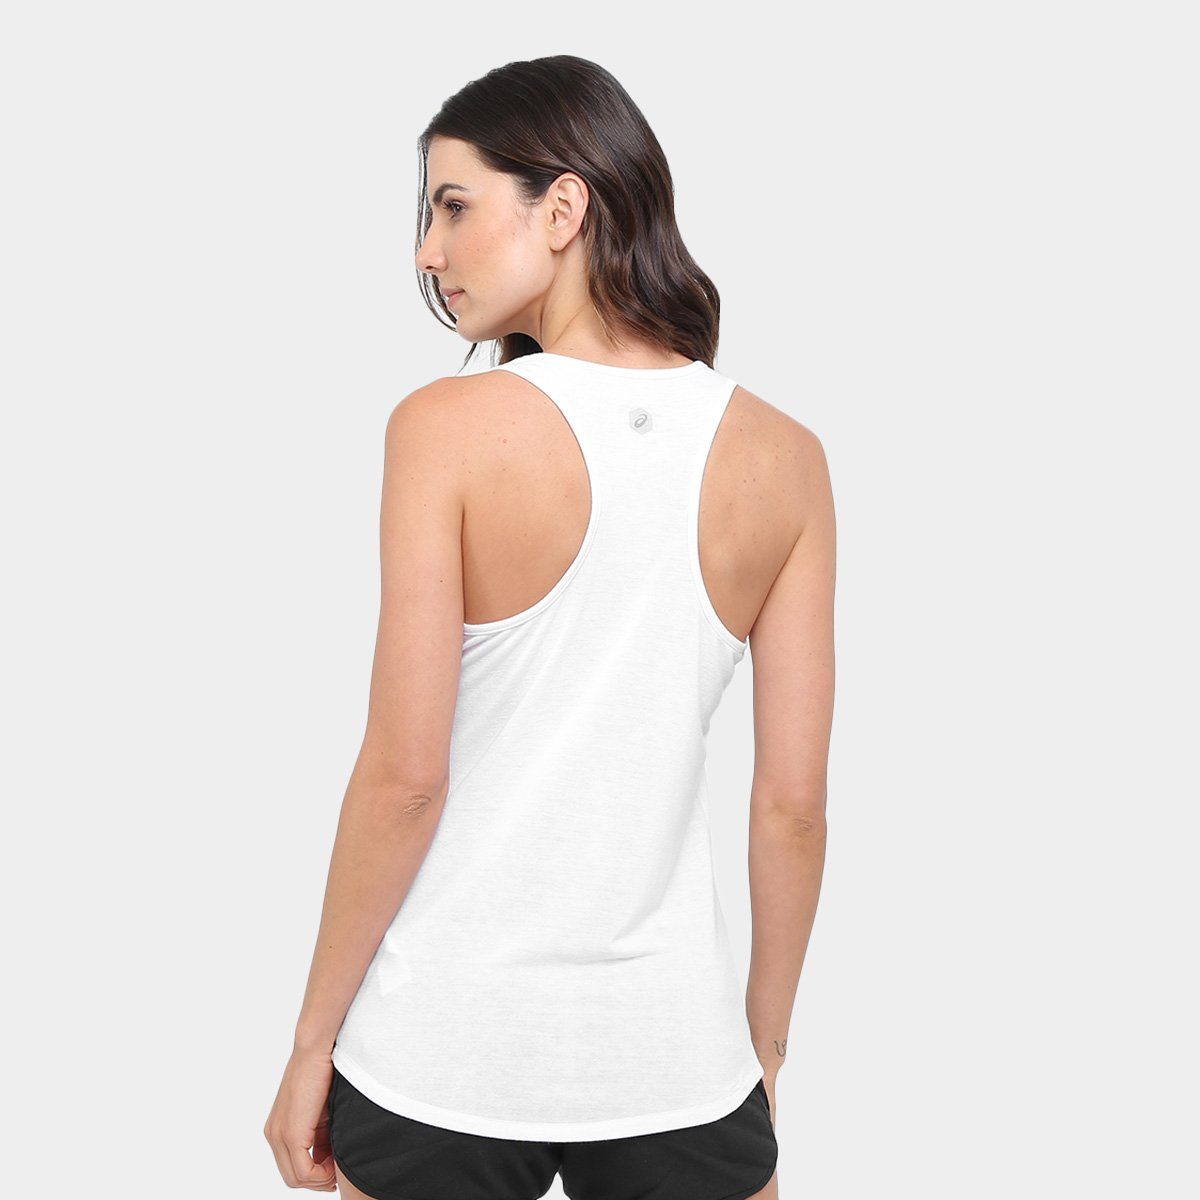 Knit Asics Tank Graphic Branco Regata Camiseta Camiseta Feminina Regata Training FwtXaa